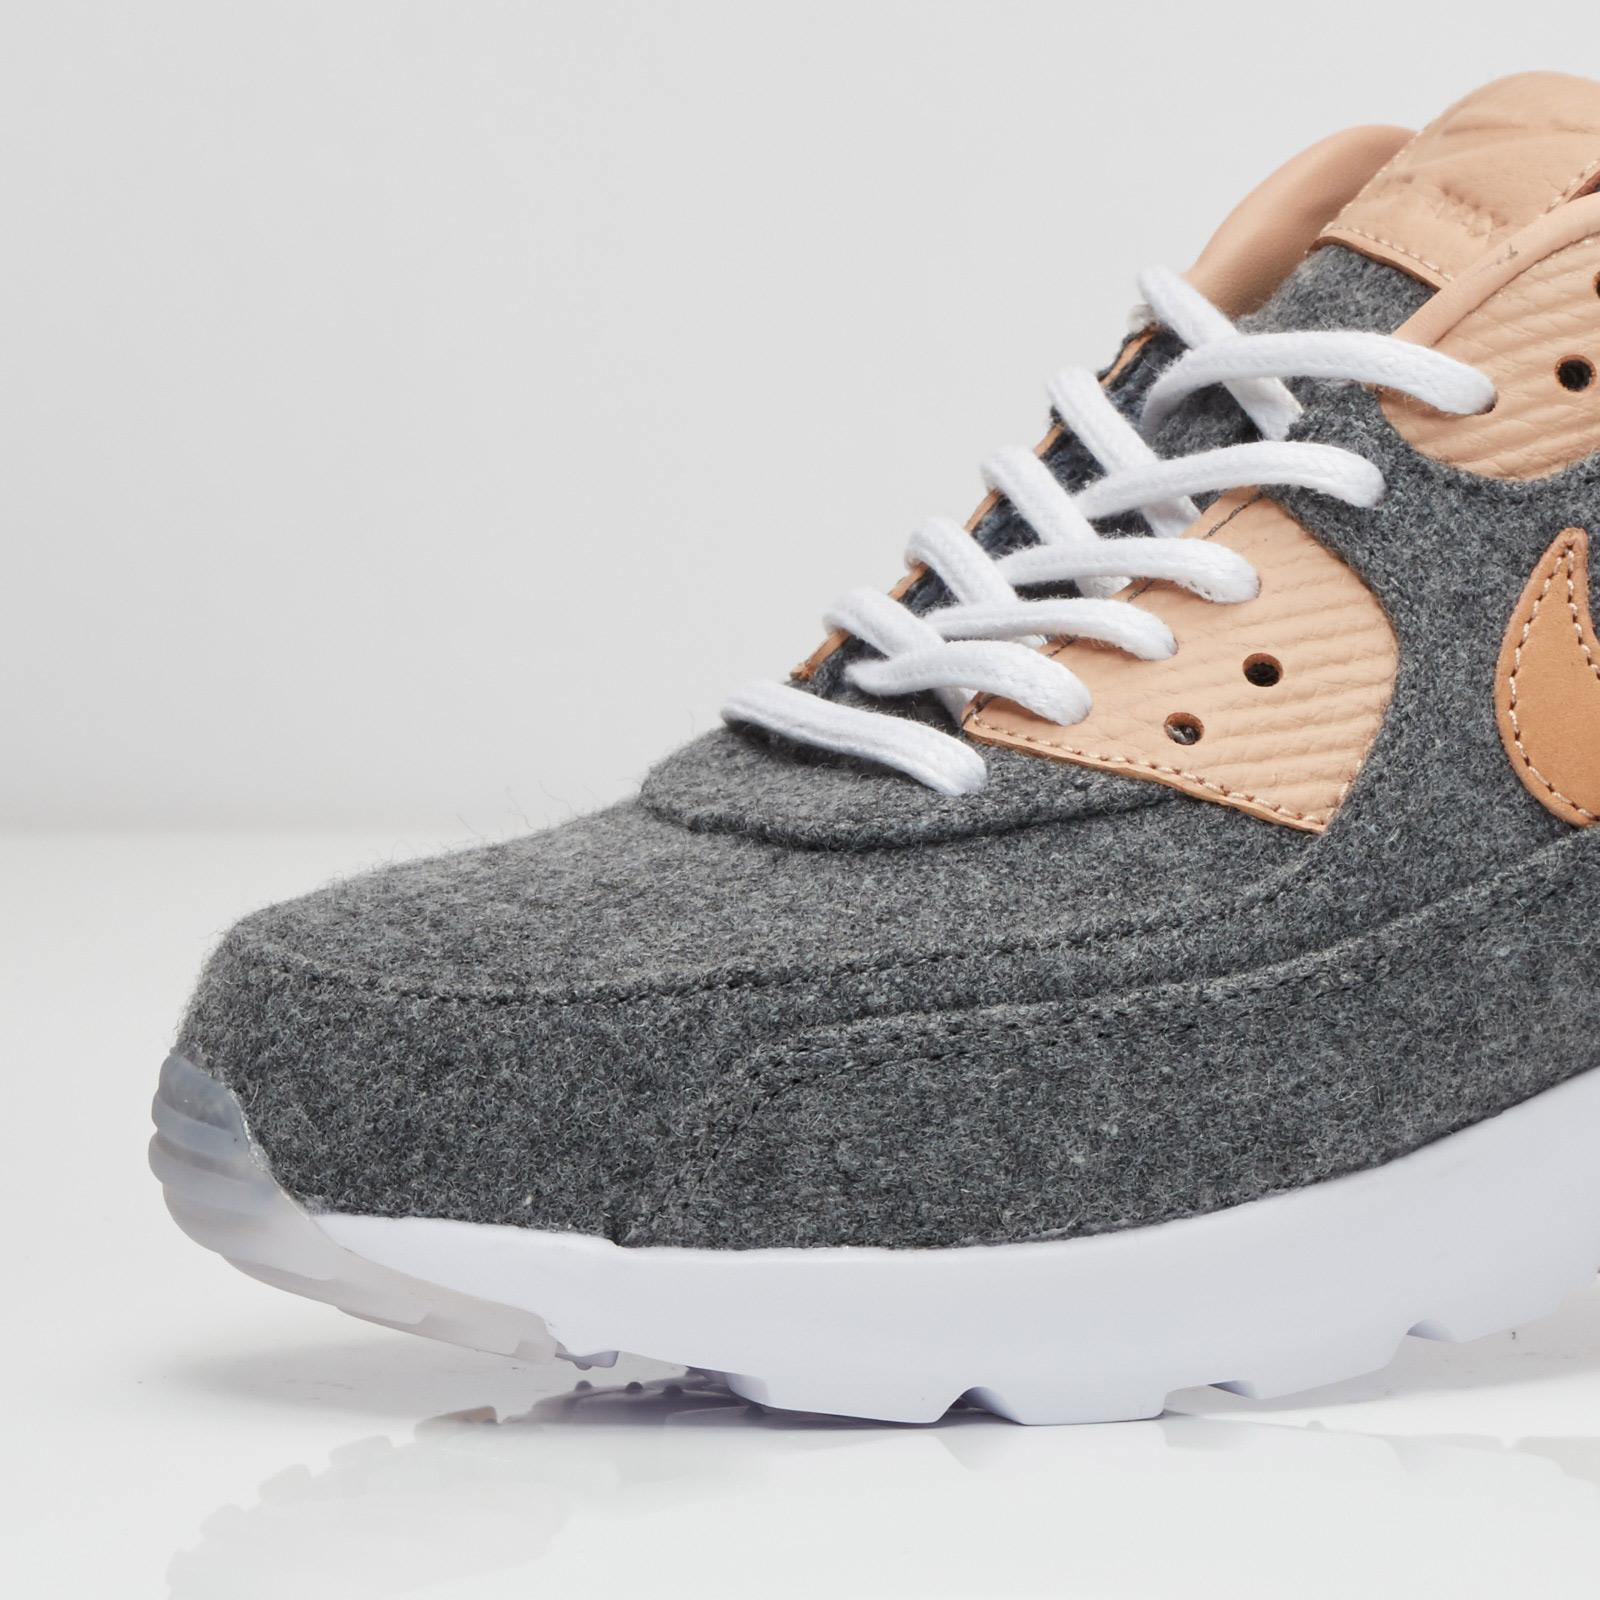 a78d613eced7 Nike Wmns Air Max 90 Ultra Premium - 859522-001 - Sneakersnstuff ...